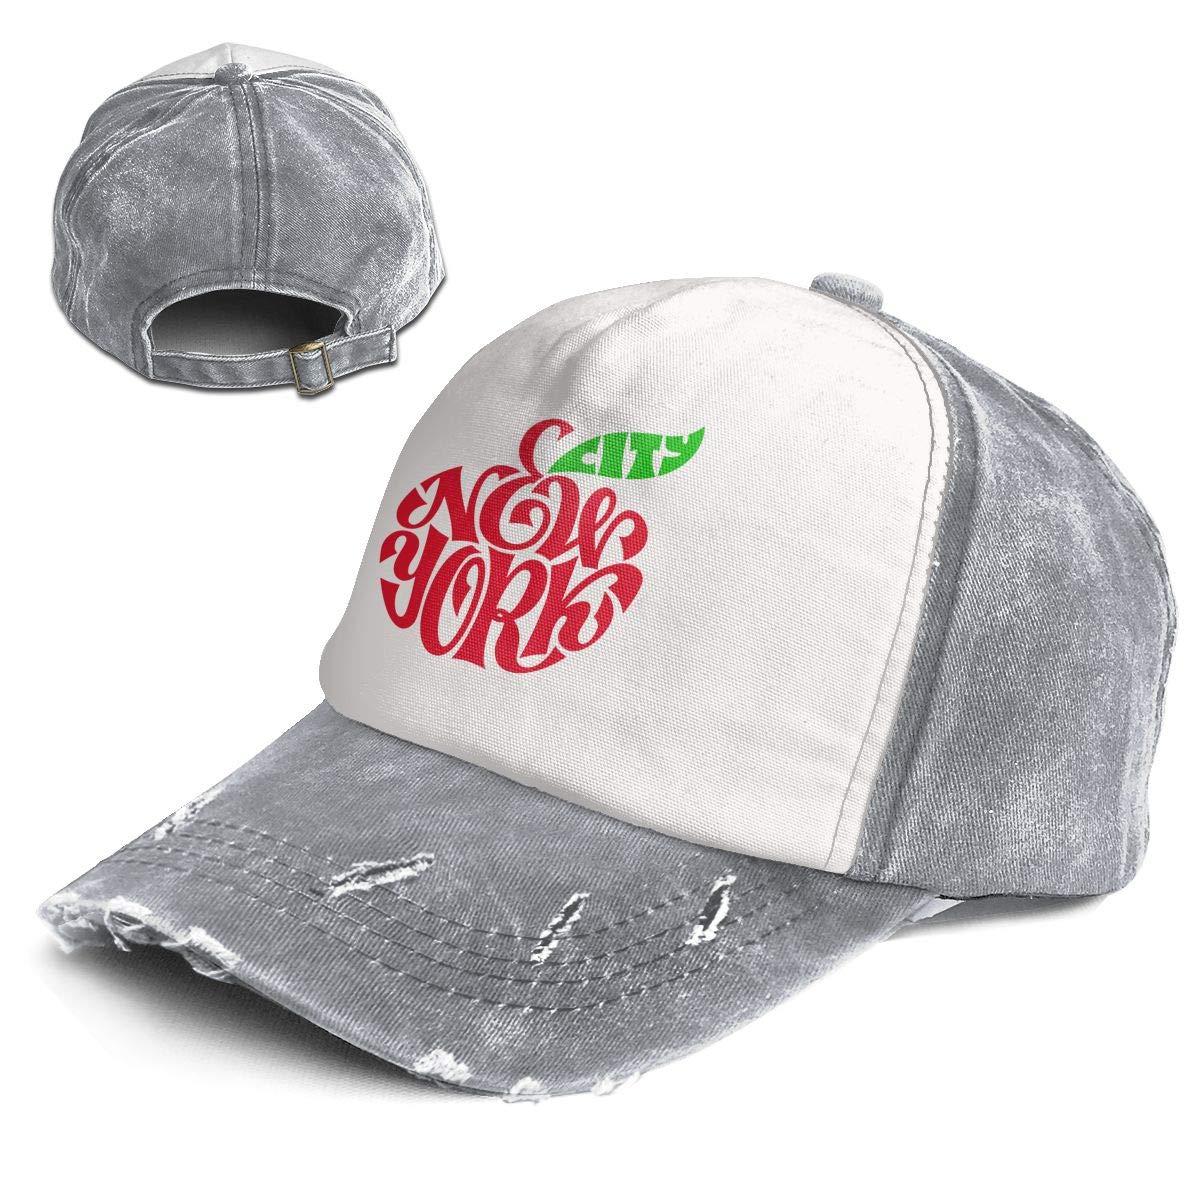 975704af Vintage General-Purpose New York Red Apple Multicolor Adjustable Baseball  Cap Dad Hat at Amazon Men's Clothing store: